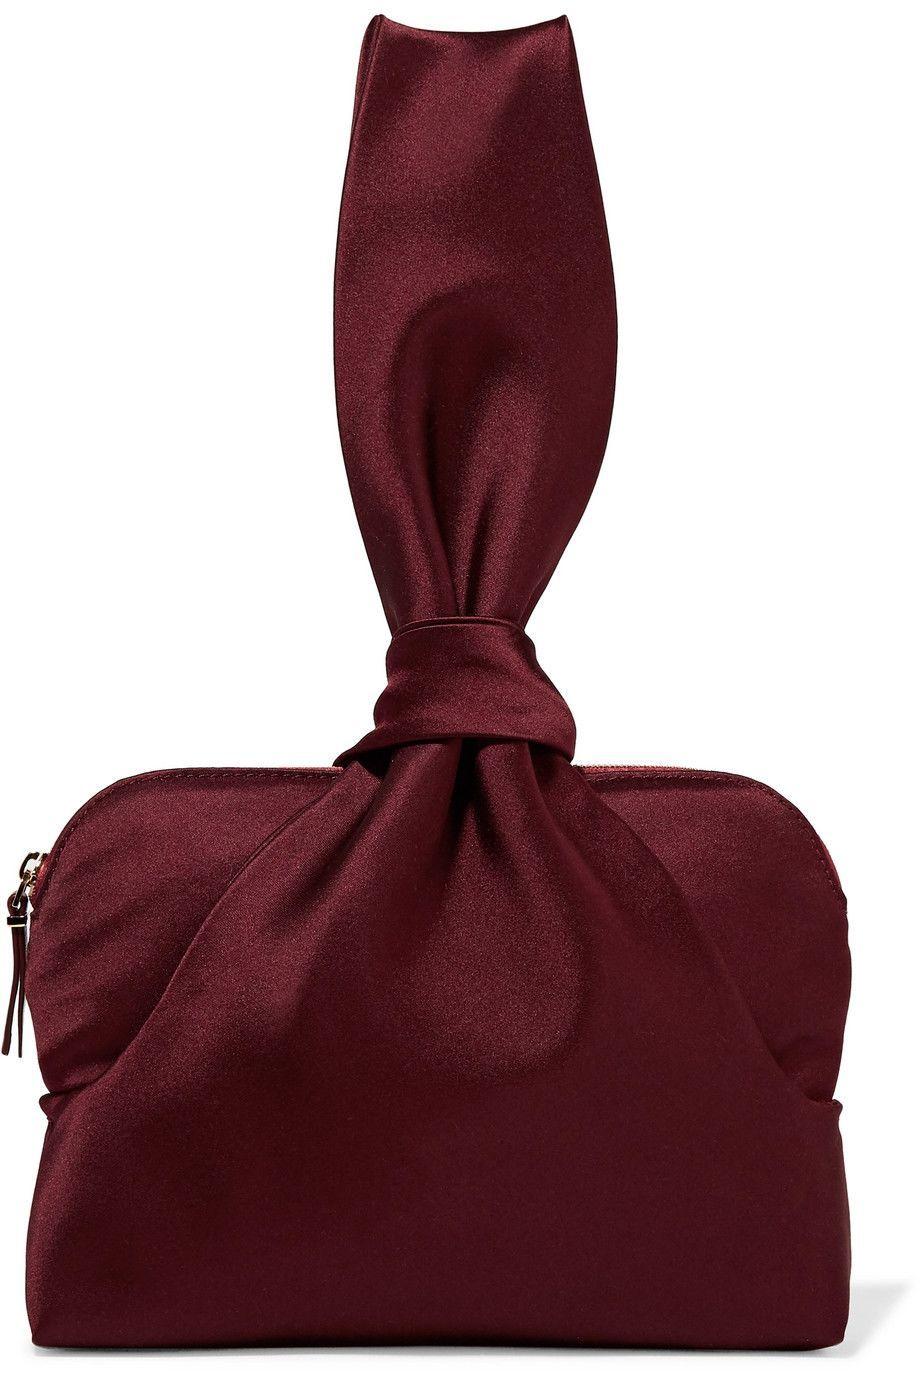 #PopbelaOOTD: Tas-tas Berdesain Unik yang Patut Kamu Tengok!